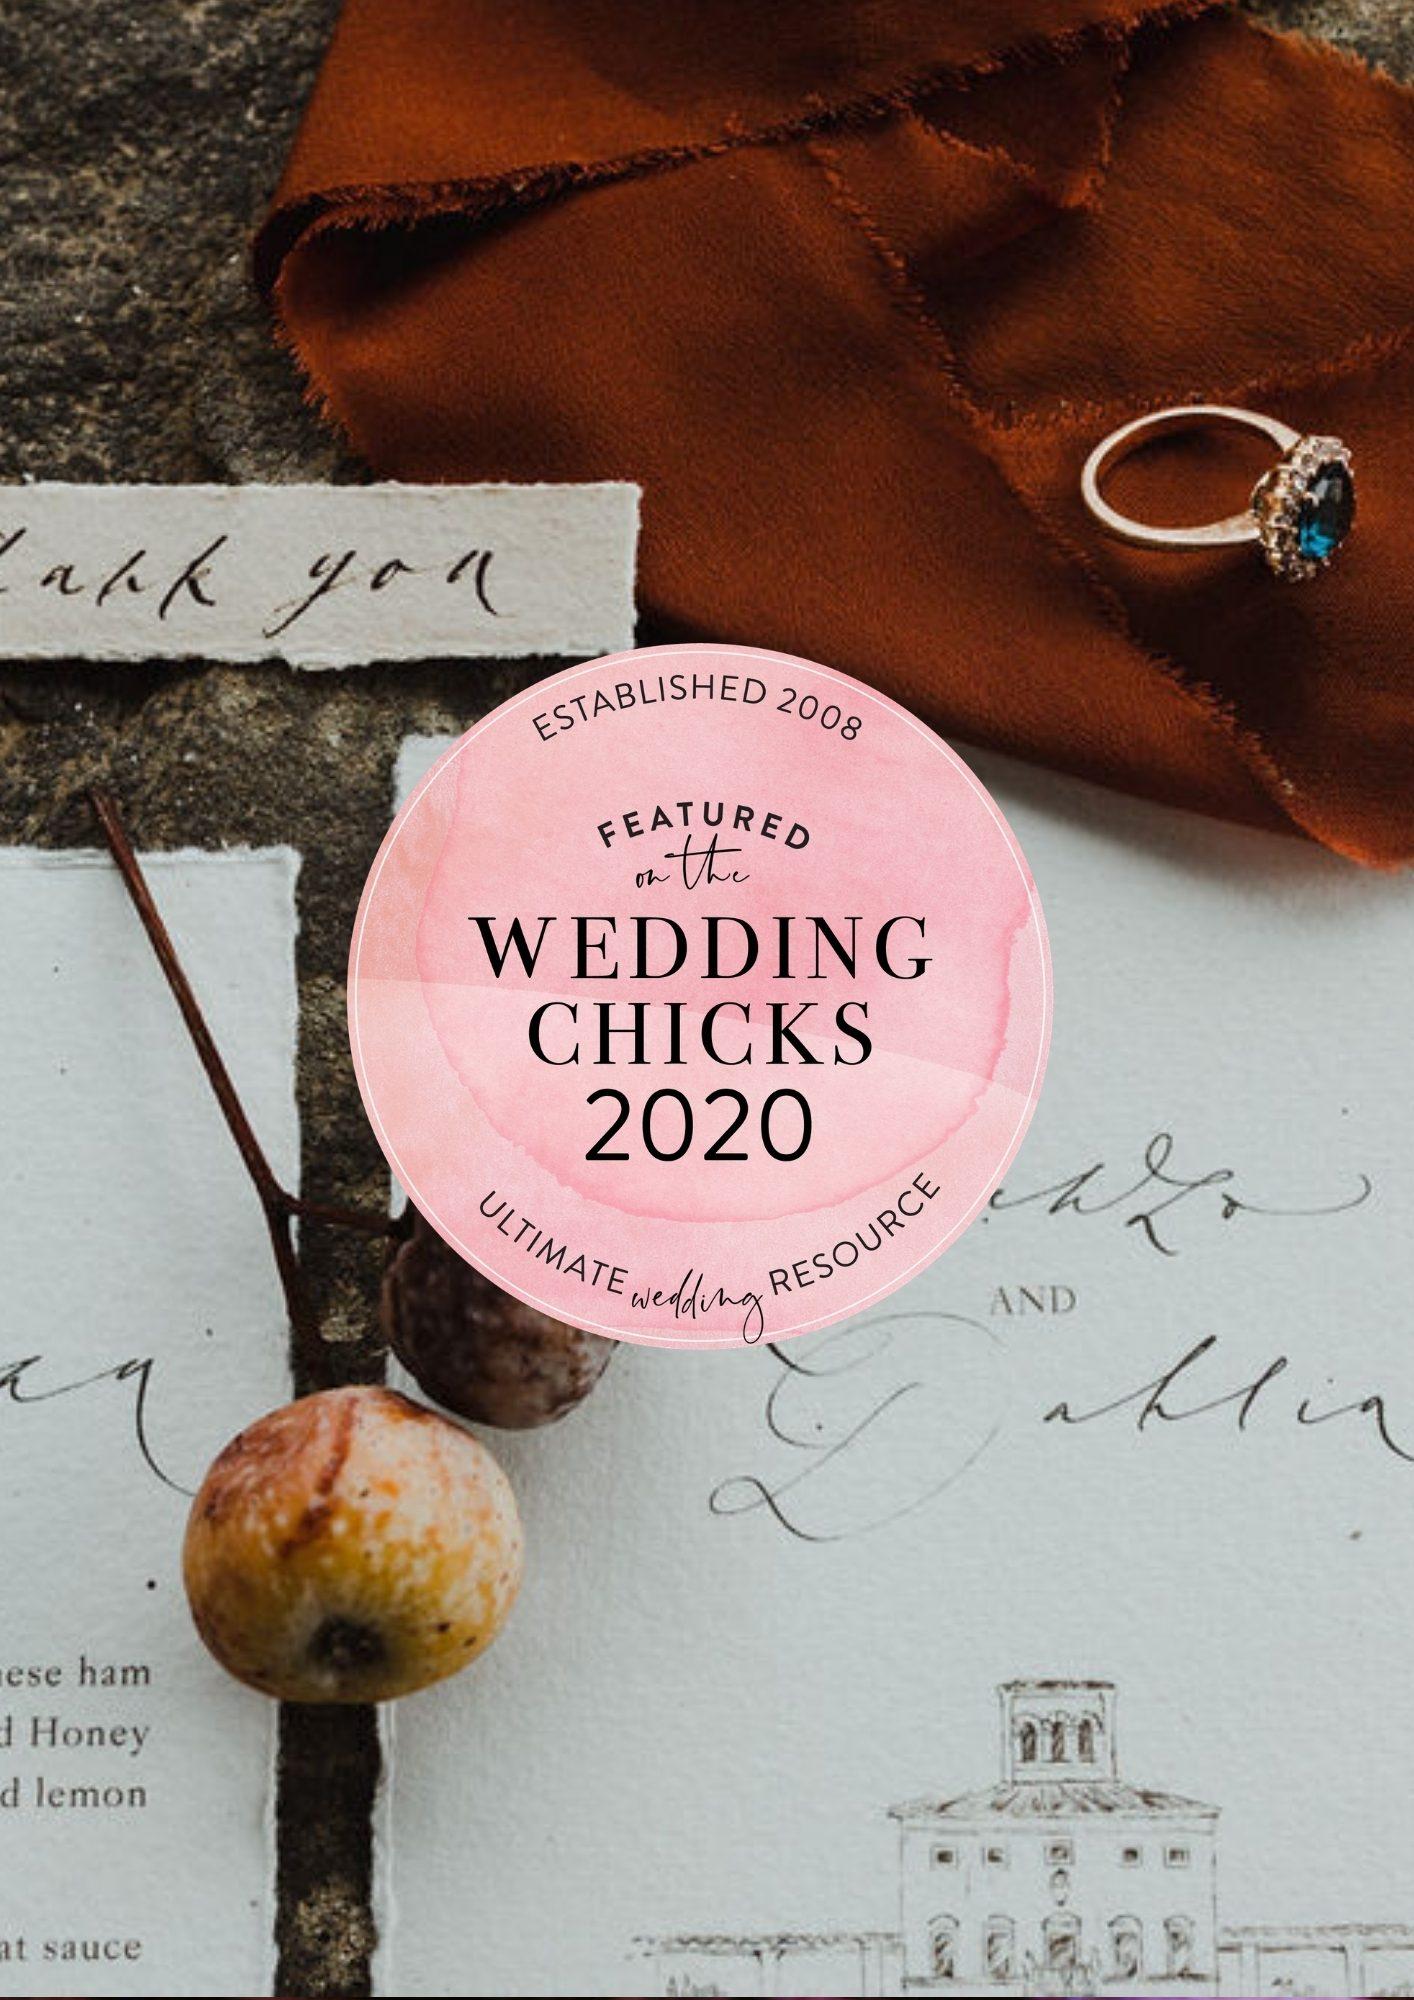 Giulia-Alessandri-Wedding-Planner-Toscana_-Pubblicazione-su-Wedding Chicks_2